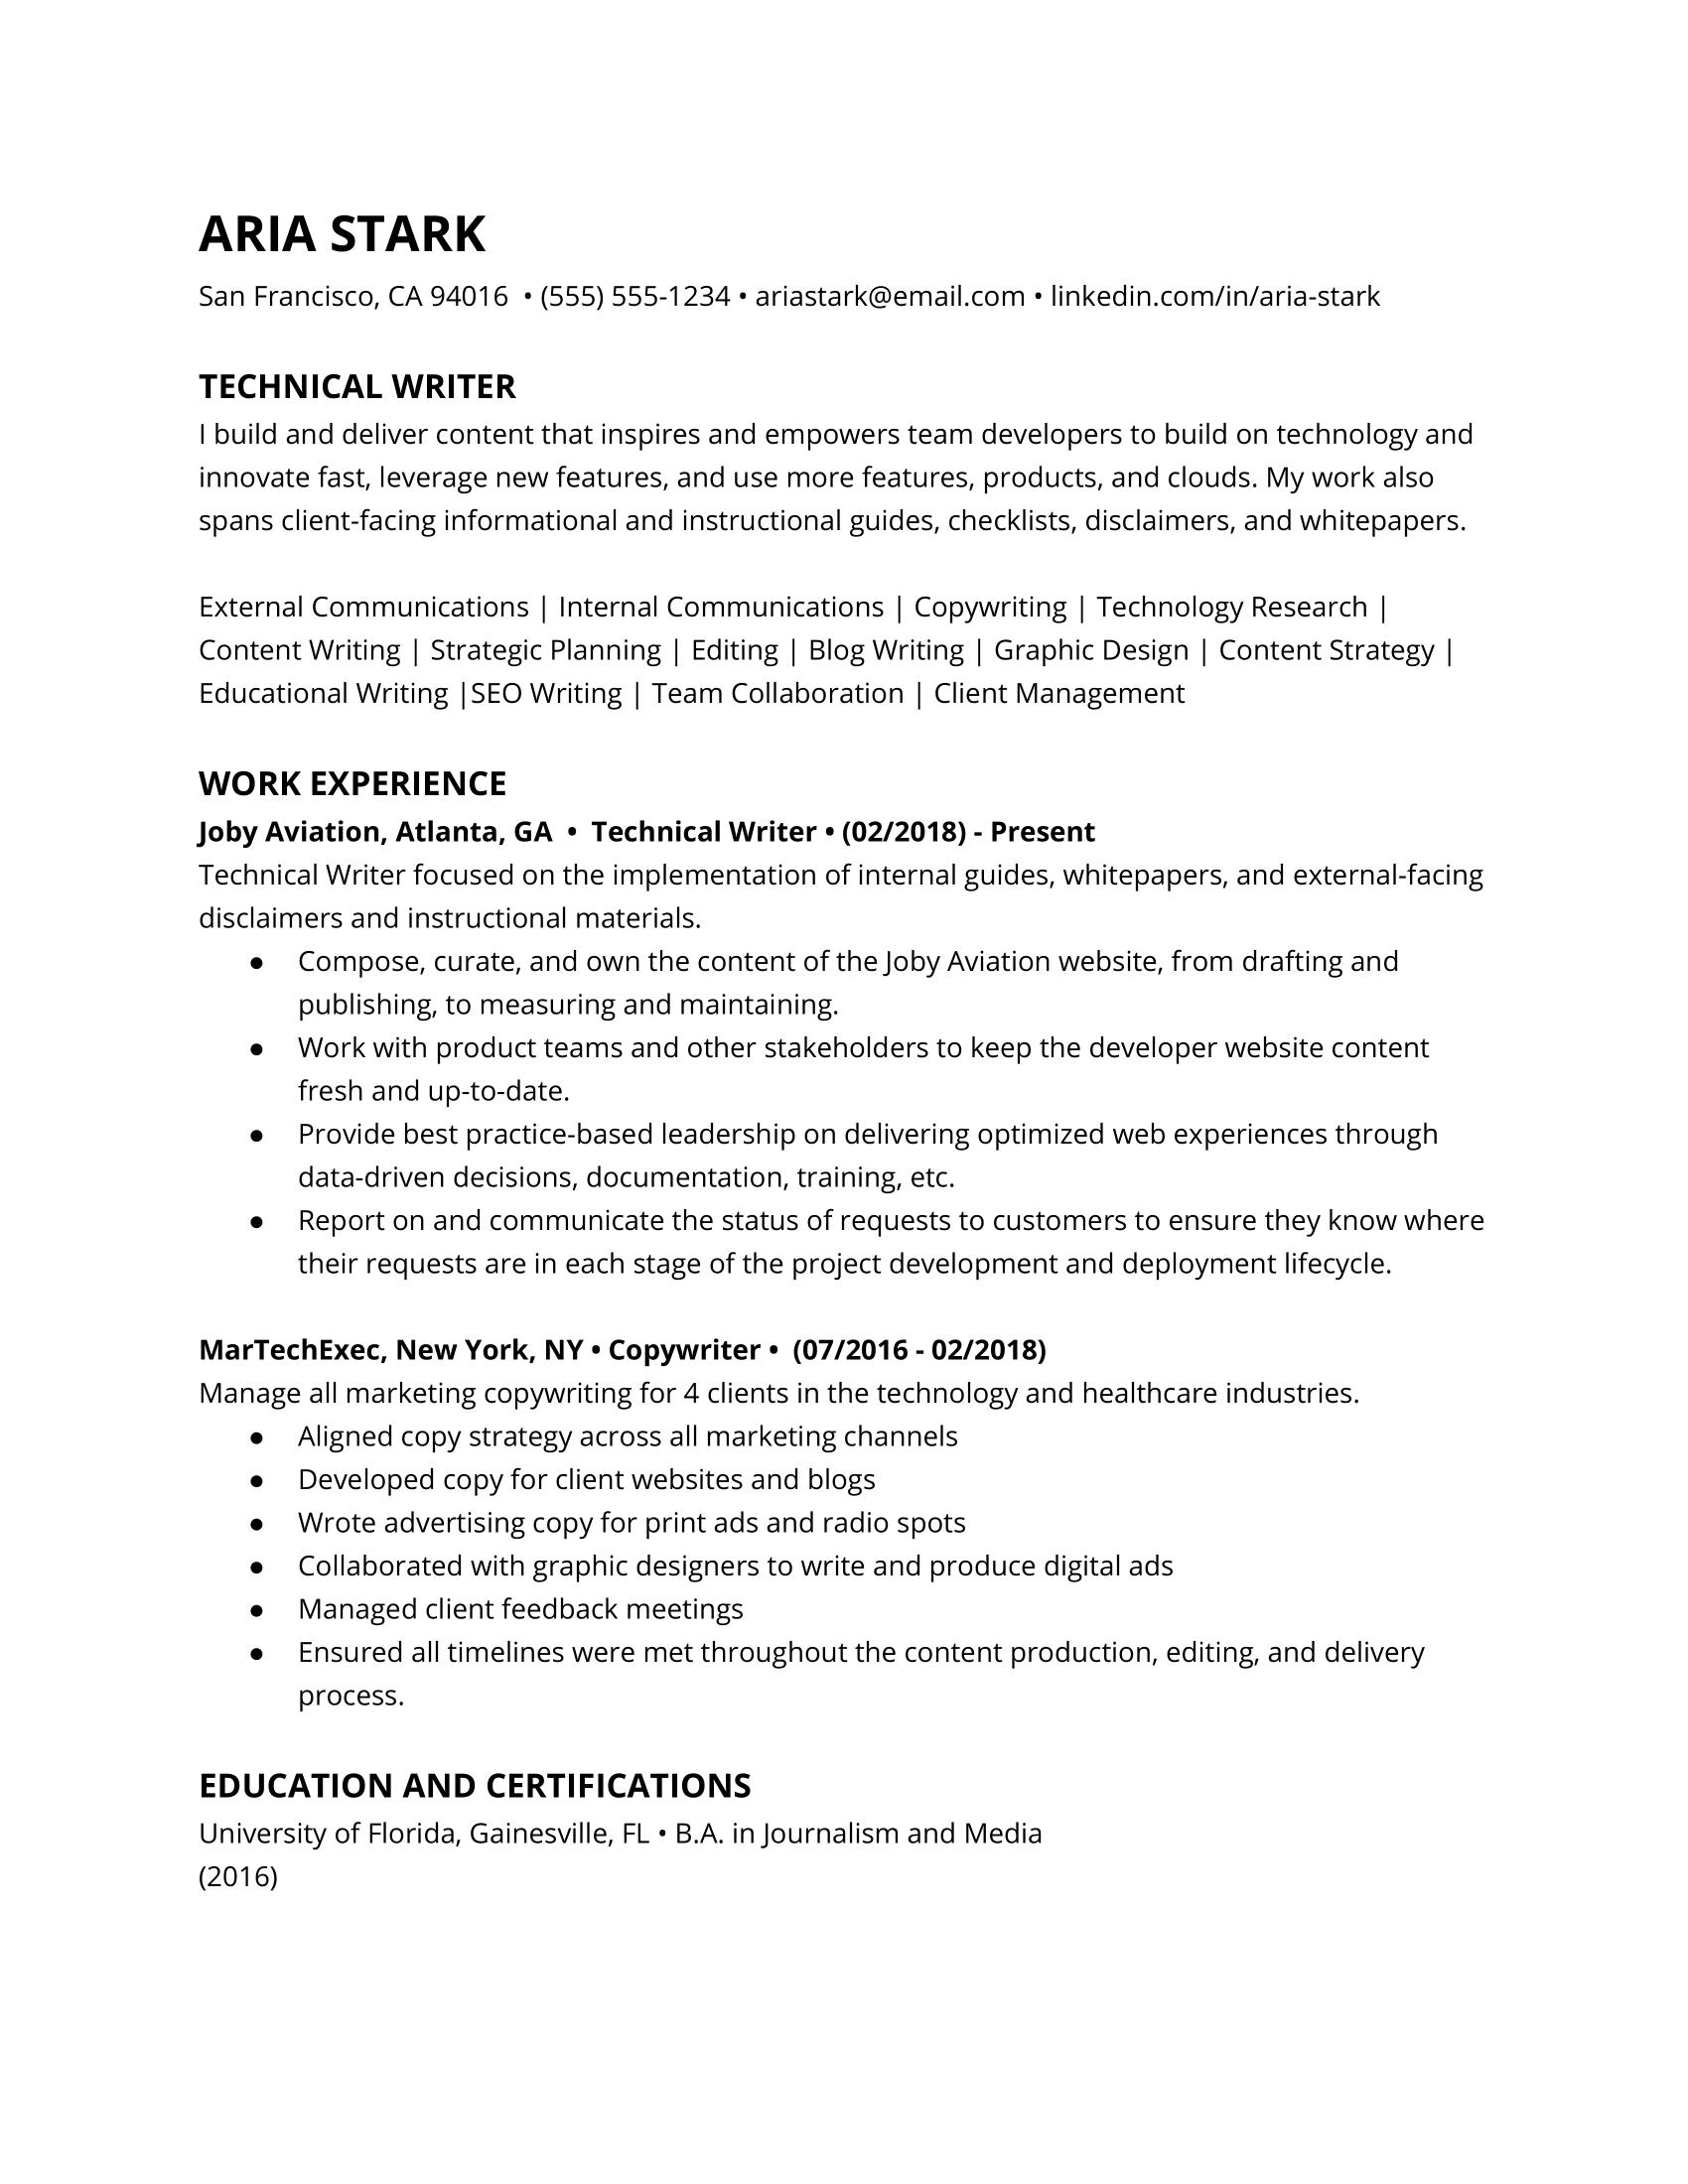 Technical writer resume example